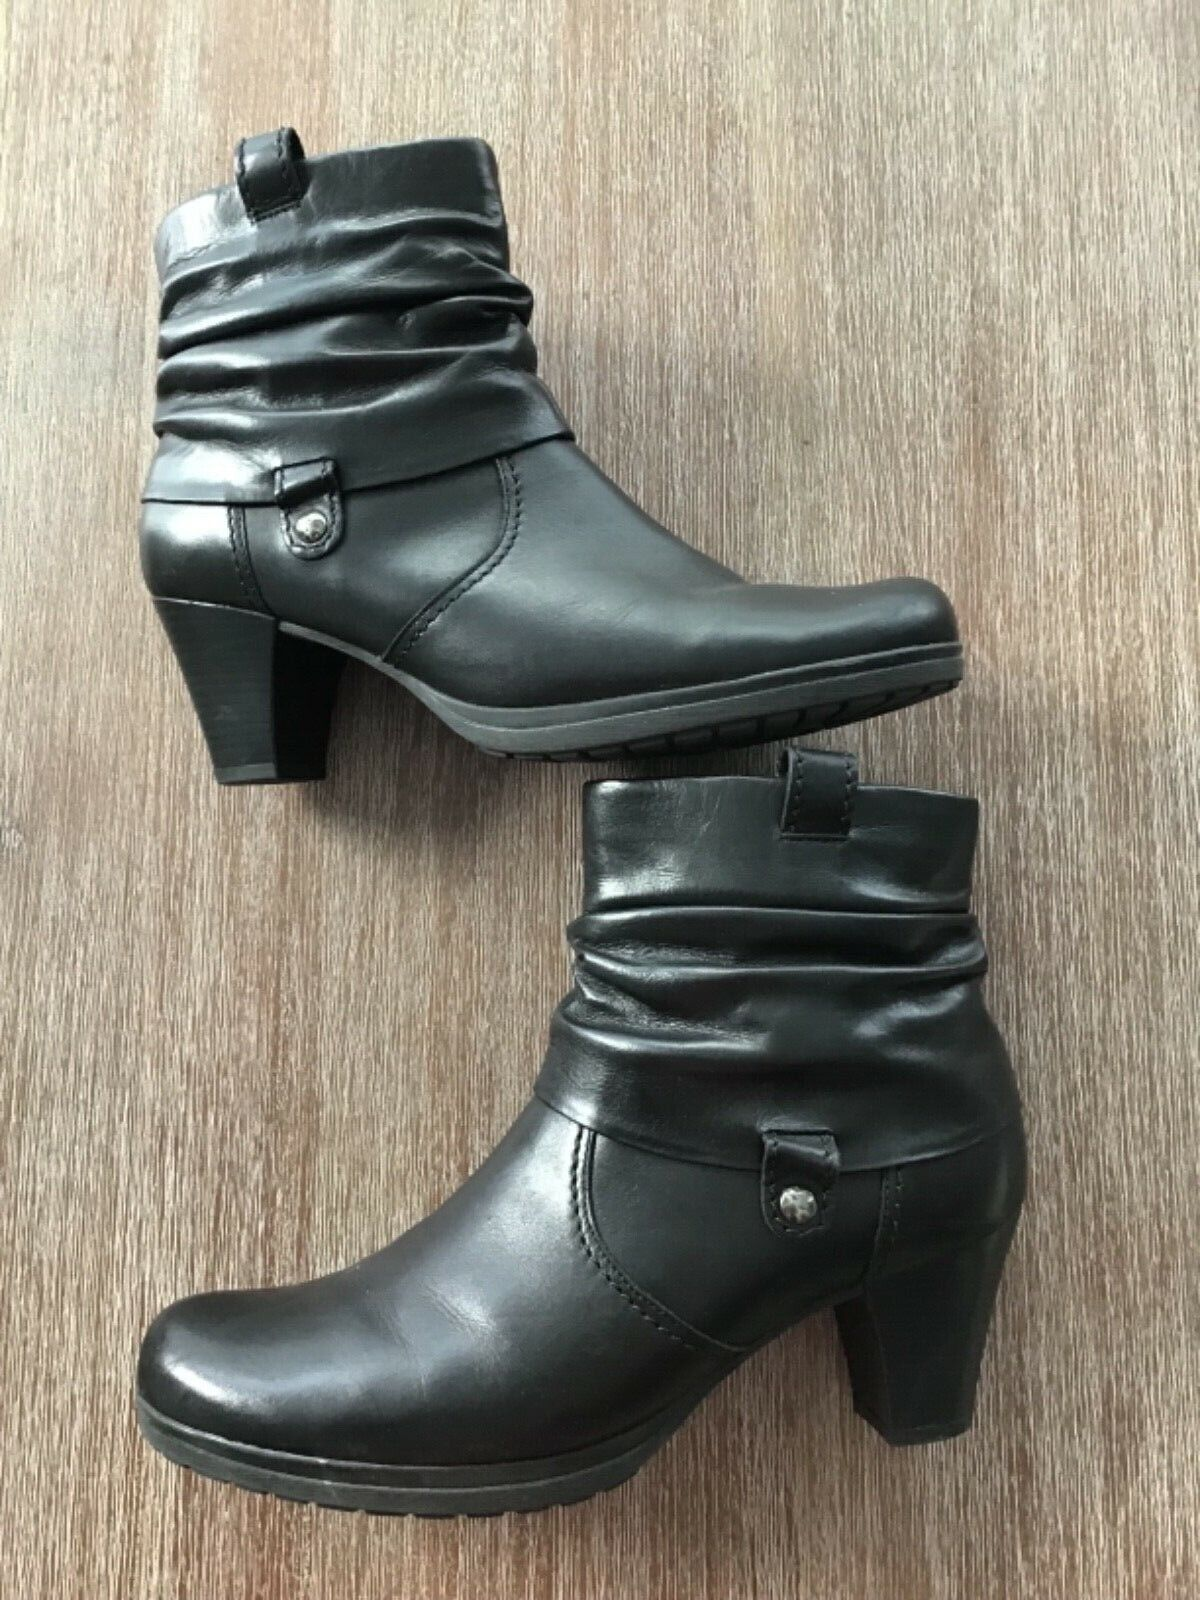 Neu Gabor Damen Stiefeletten schwarz Gr.41 UK8 Echtleder Ankle Boots